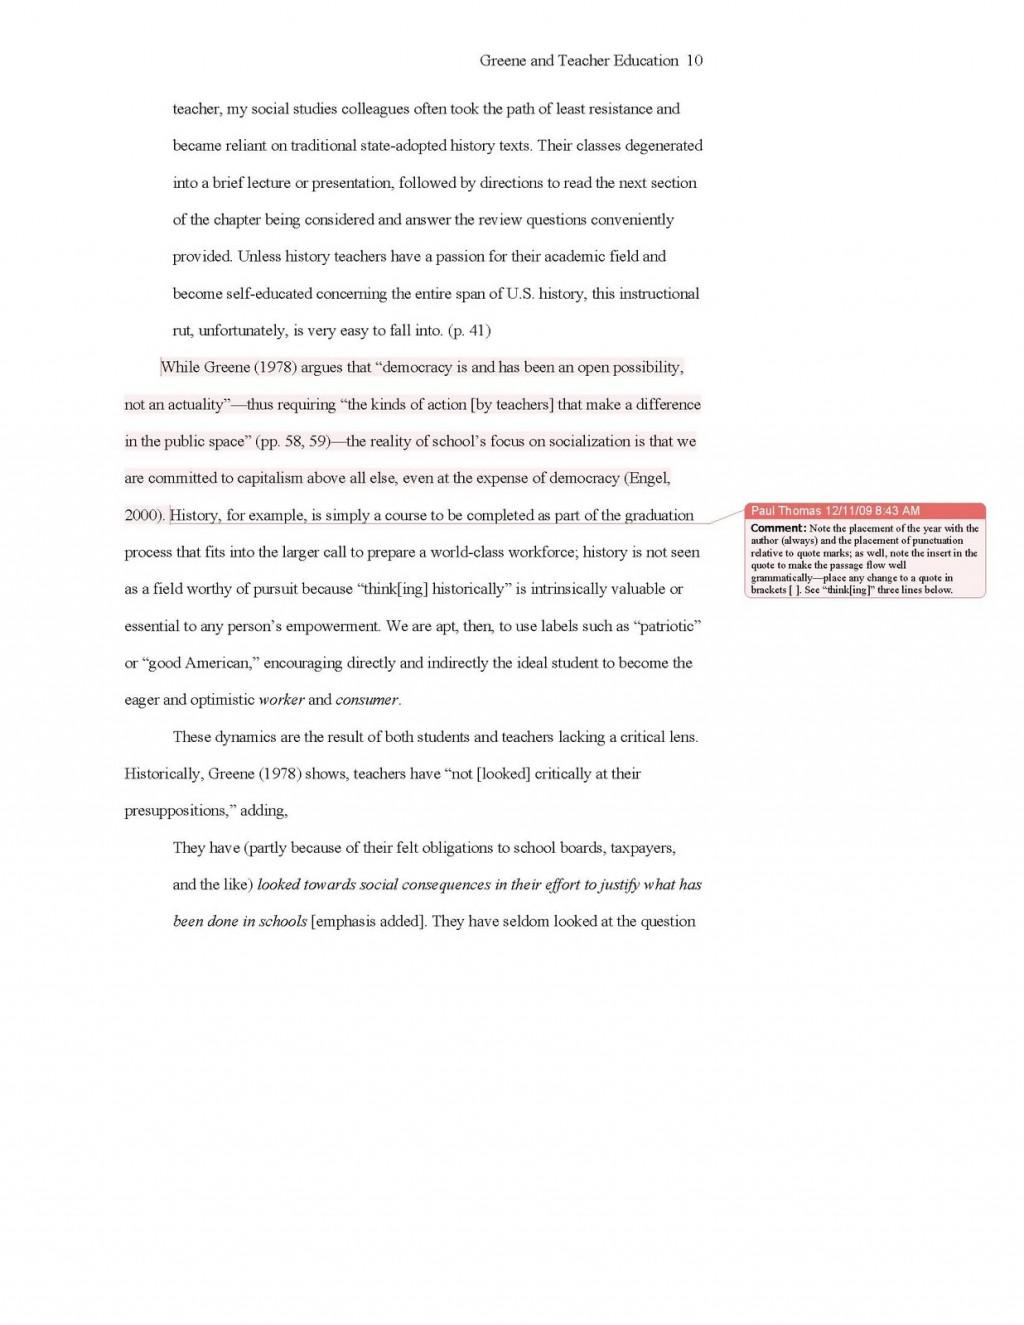 004 Essay Example Style Apa Sample Amazing Styles Of Communication Music Writing Guide Large